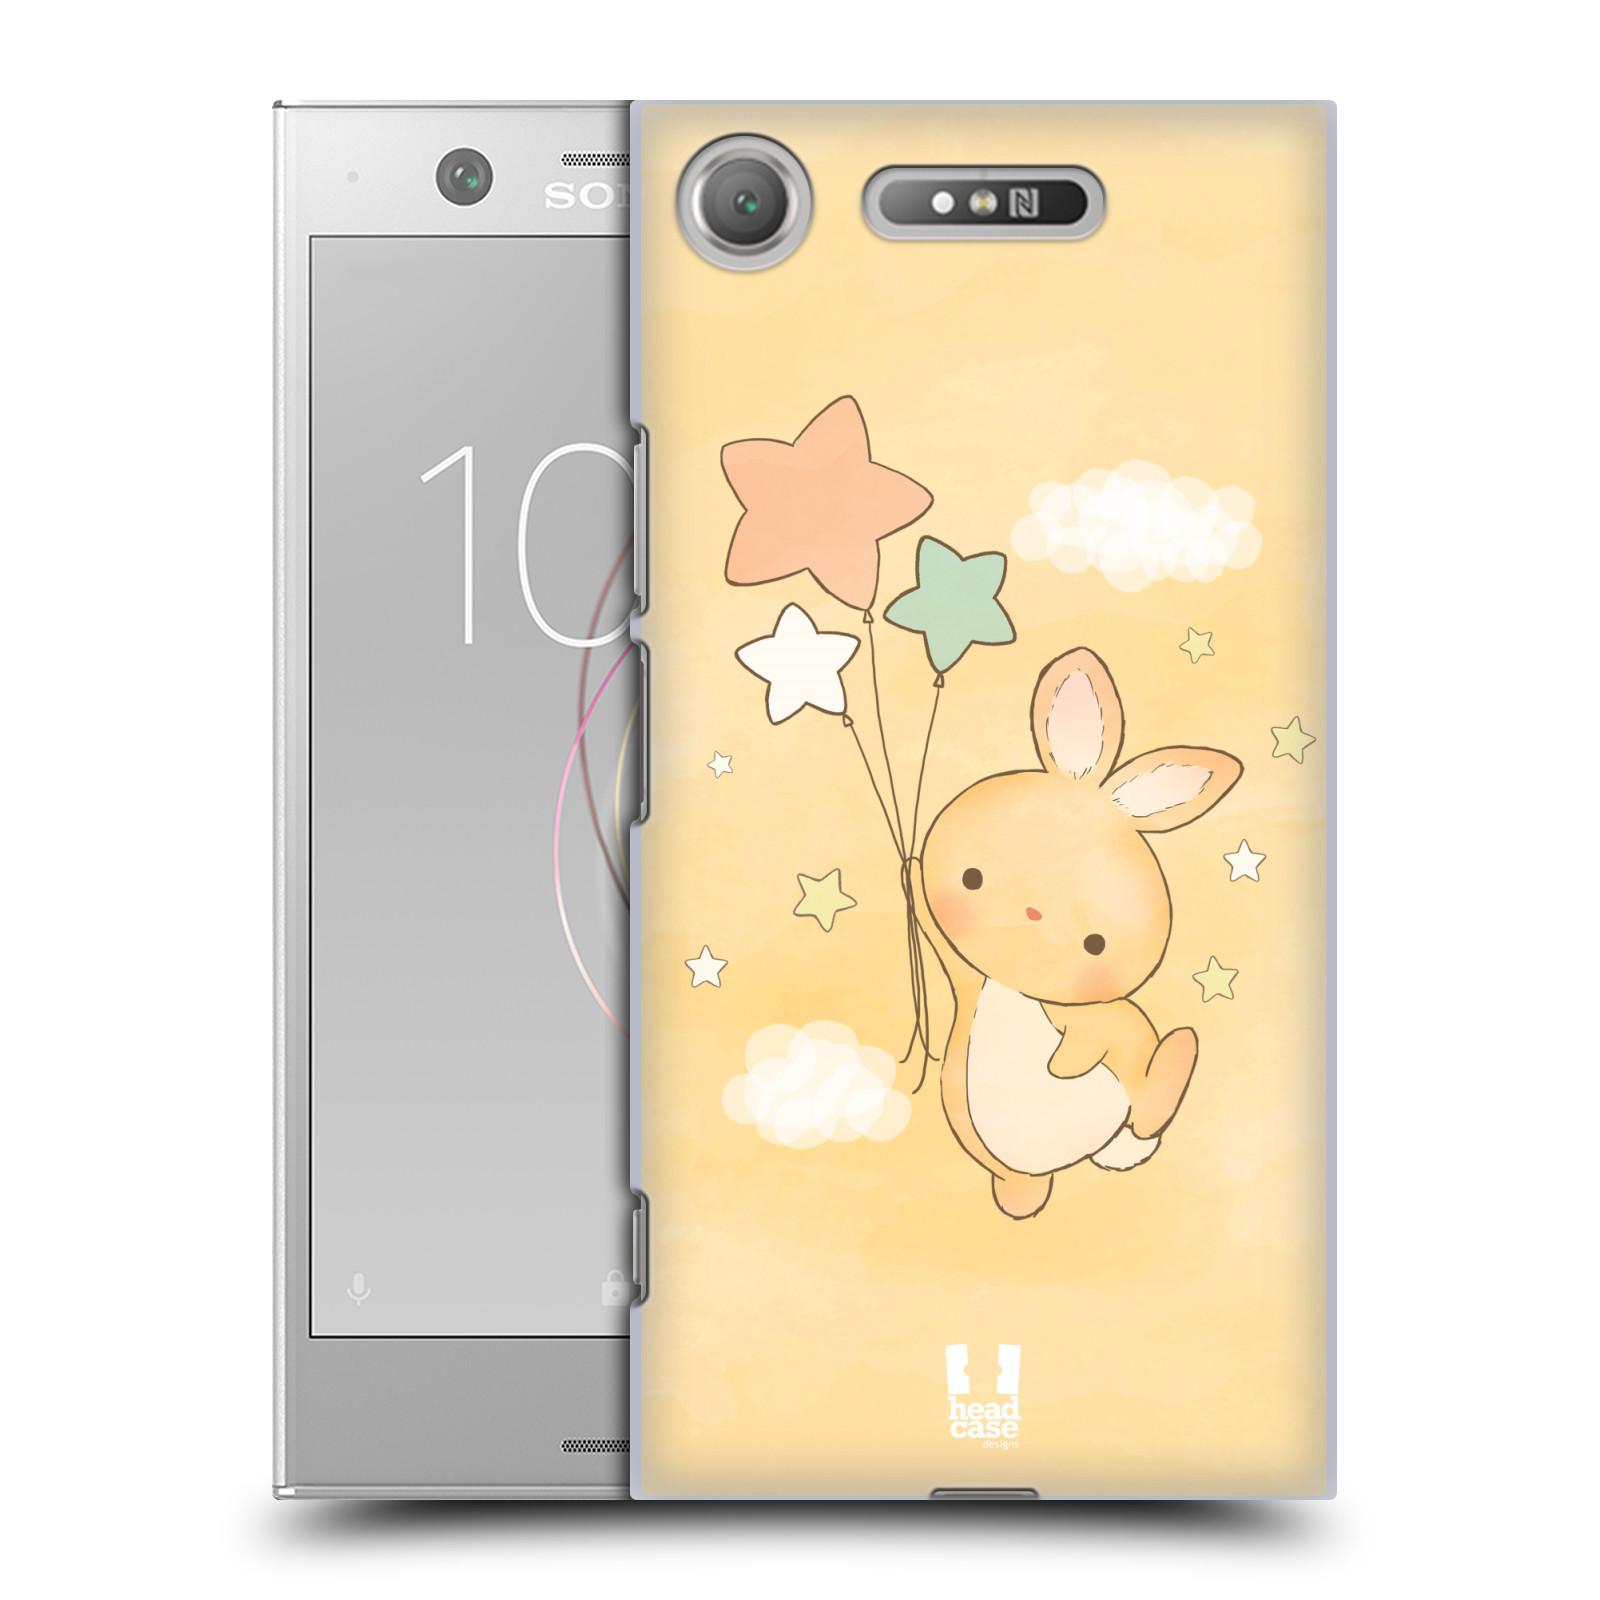 HEAD CASE plastový obal na mobil Sony Xperia XZ1 vzor králíček a hvězdy žlutá